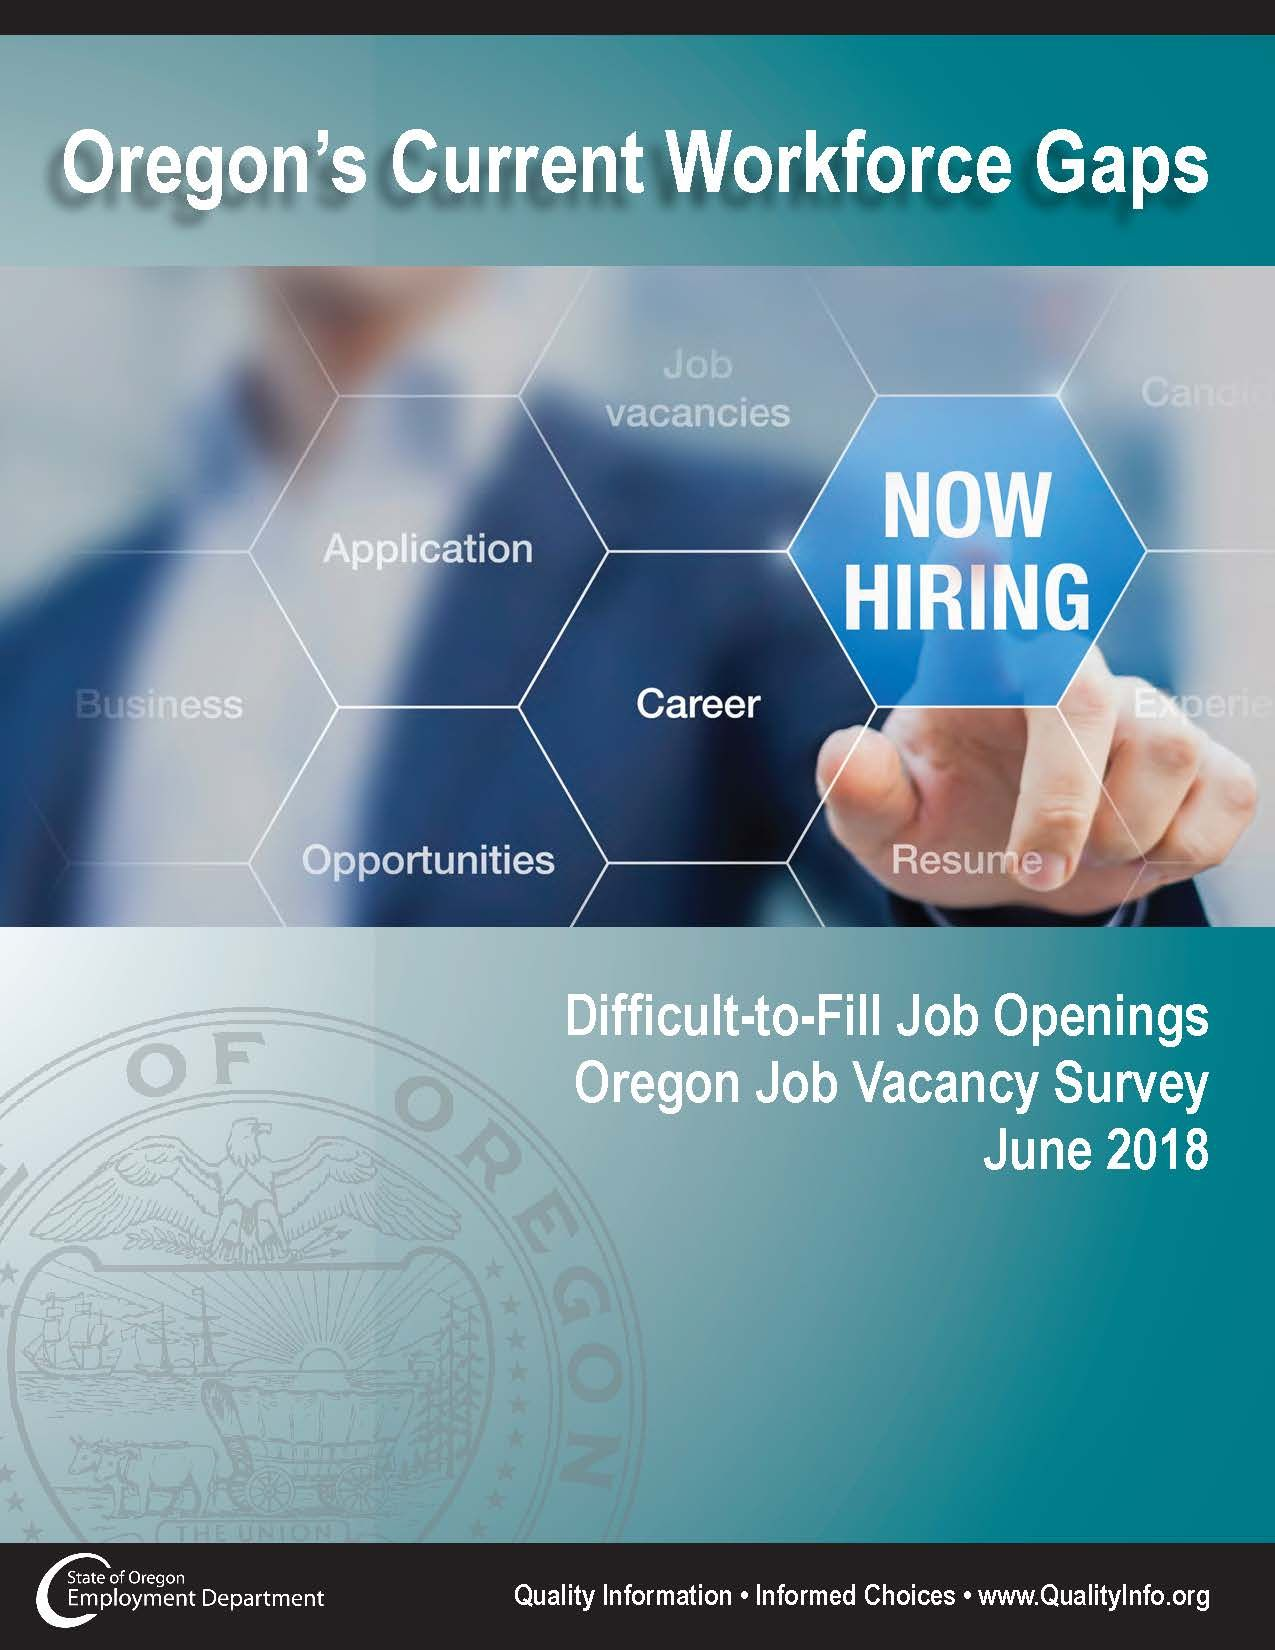 Oregon's current workforce gaps difficulttofill job